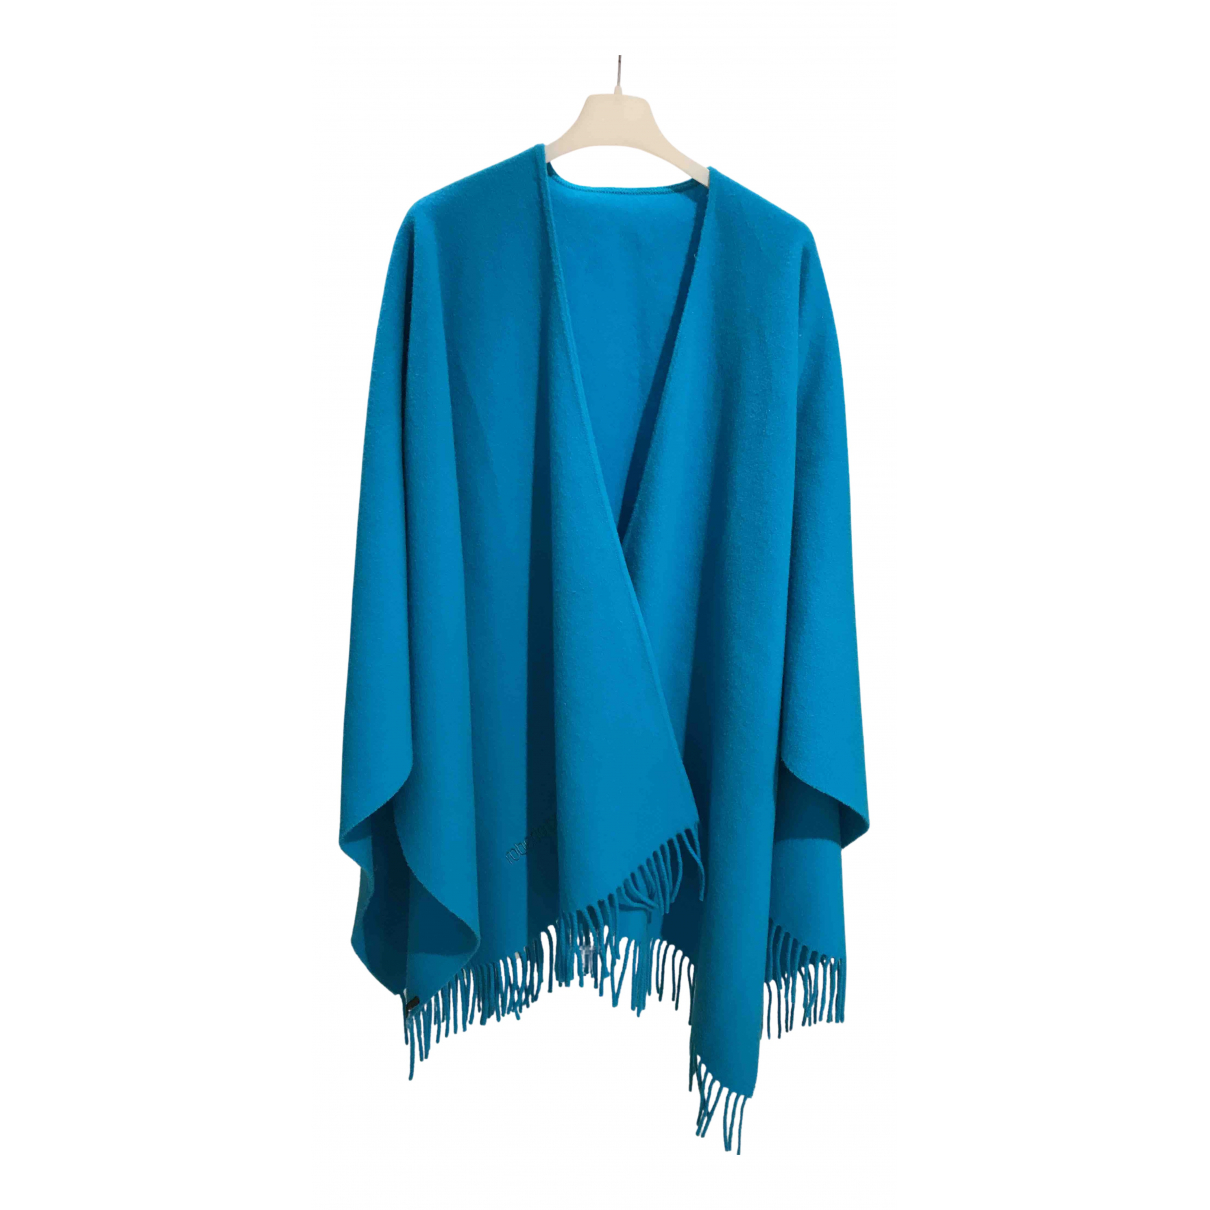 Roberto Cavalli N Turquoise Wool Knitwear for Women One Size FR